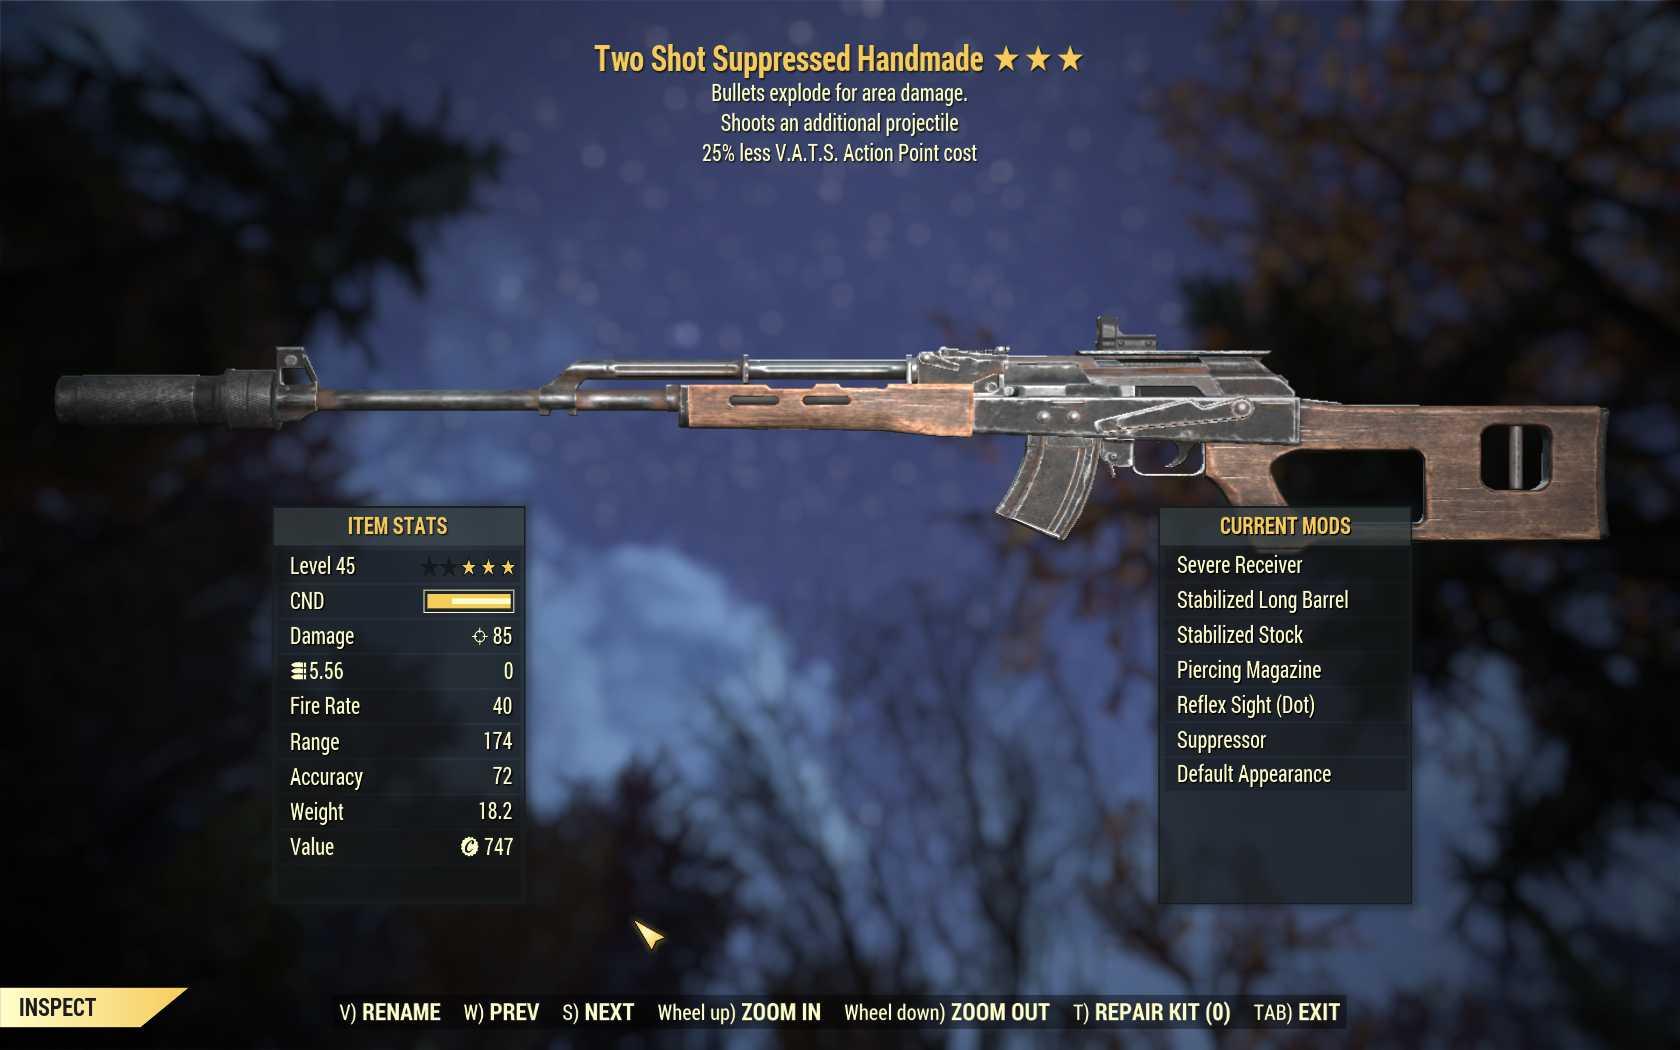 Two Shot Explosive Handmade (25% less VATS AP cost)